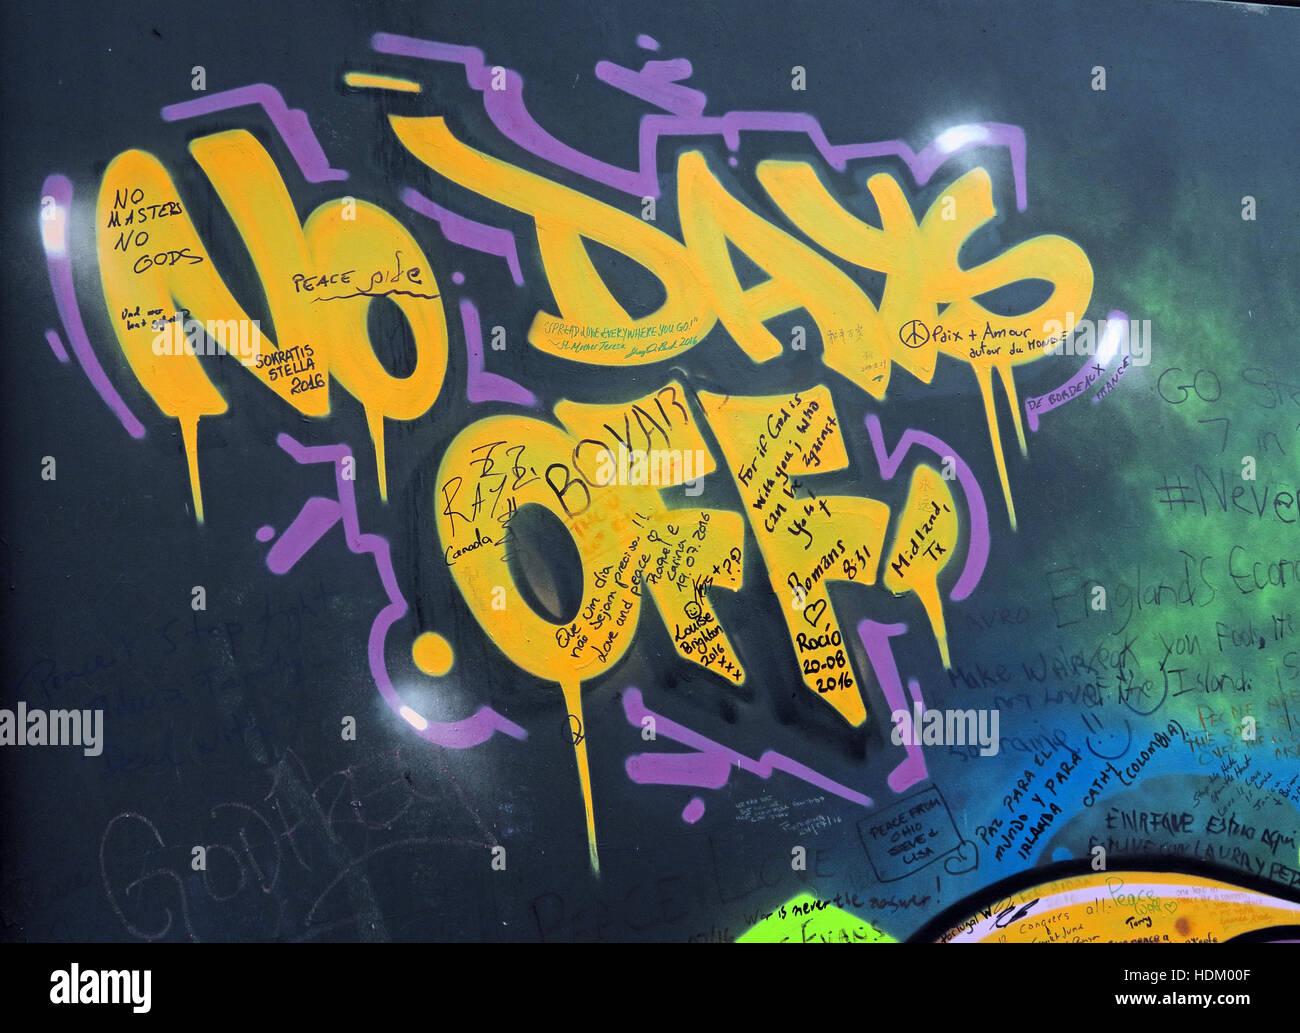 Laden Sie dieses Alamy Stockfoto Keine Tage Off - Belfast International Peace Wall Graffiti Cupar Weg, West Belfast, NI, UK - HDM00F